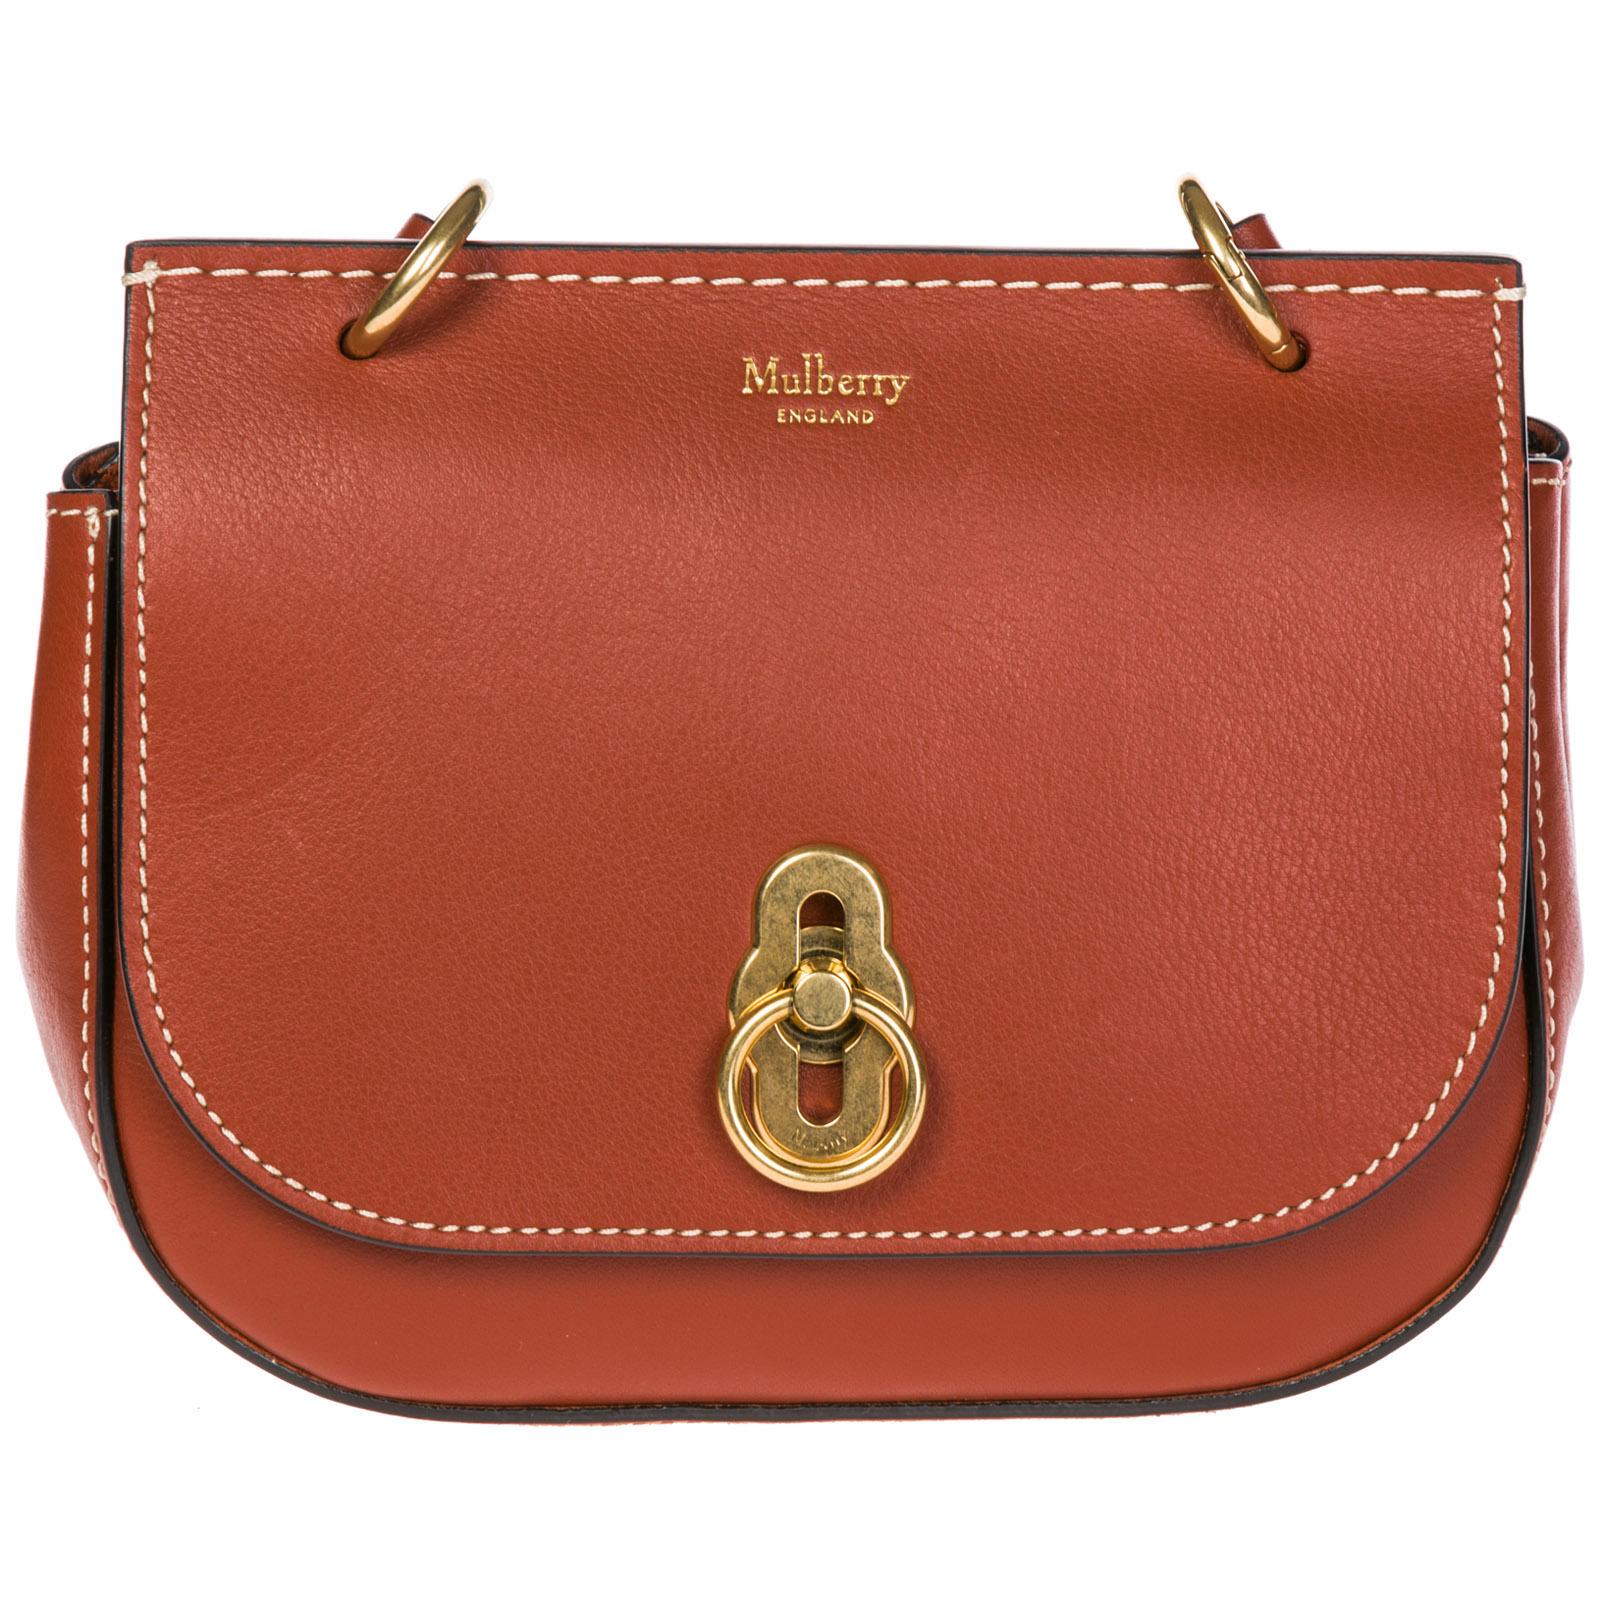 222a34f9c2 Women s leather cross-body messenger shoulder bag ...